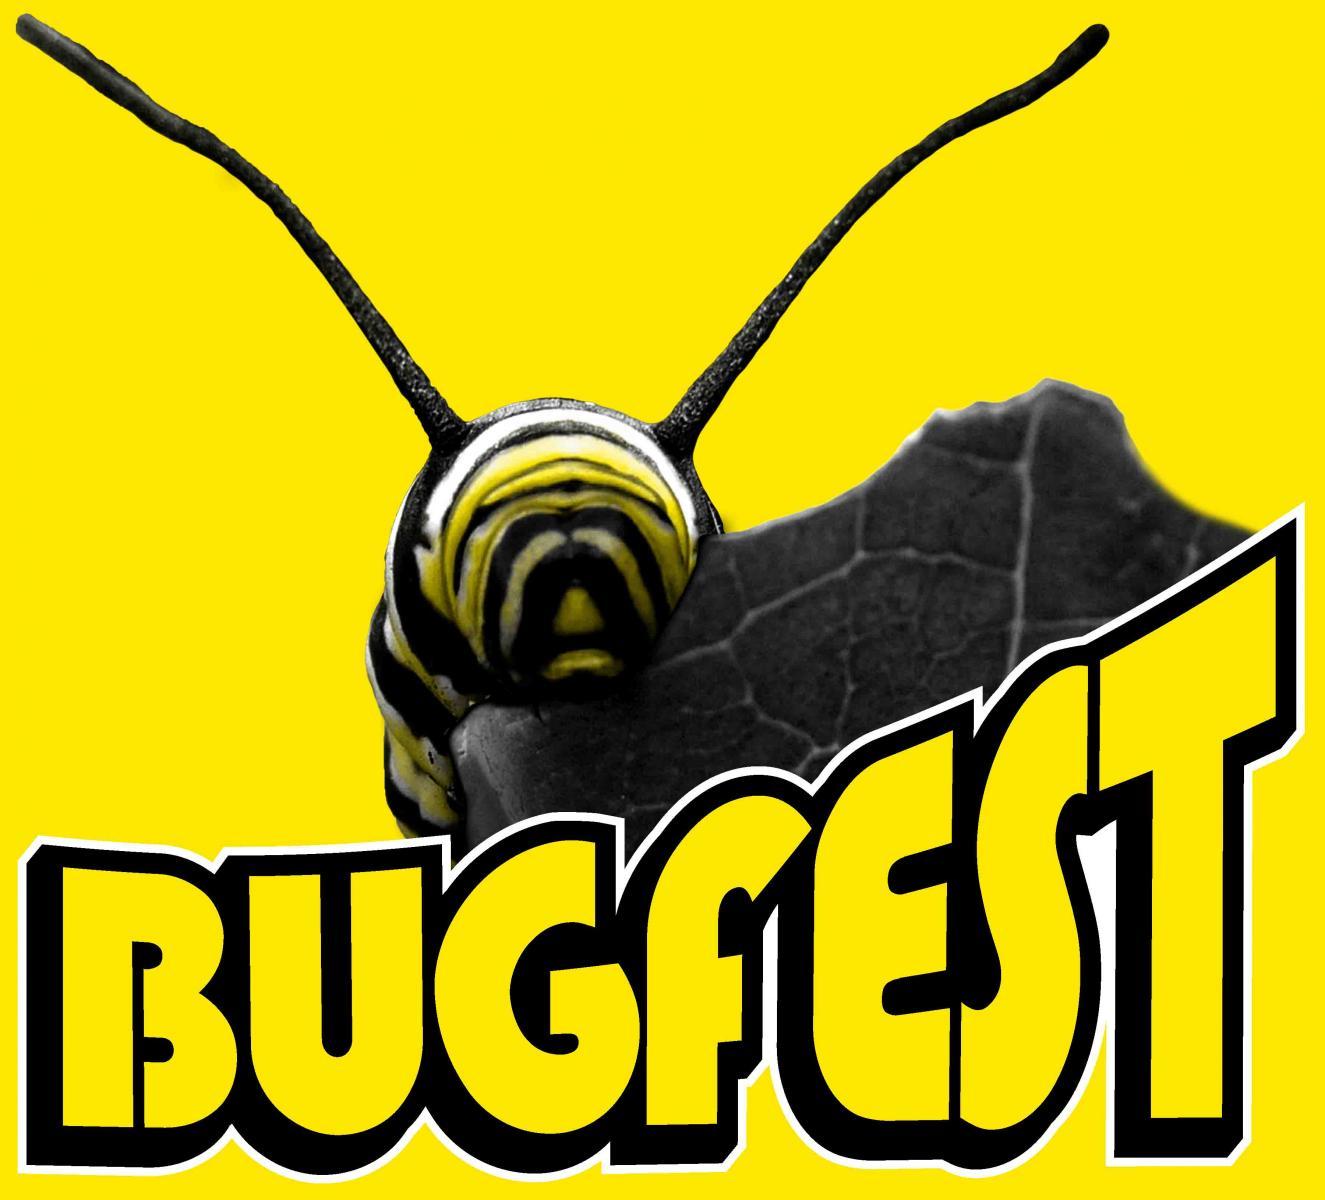 bugfest.jpg